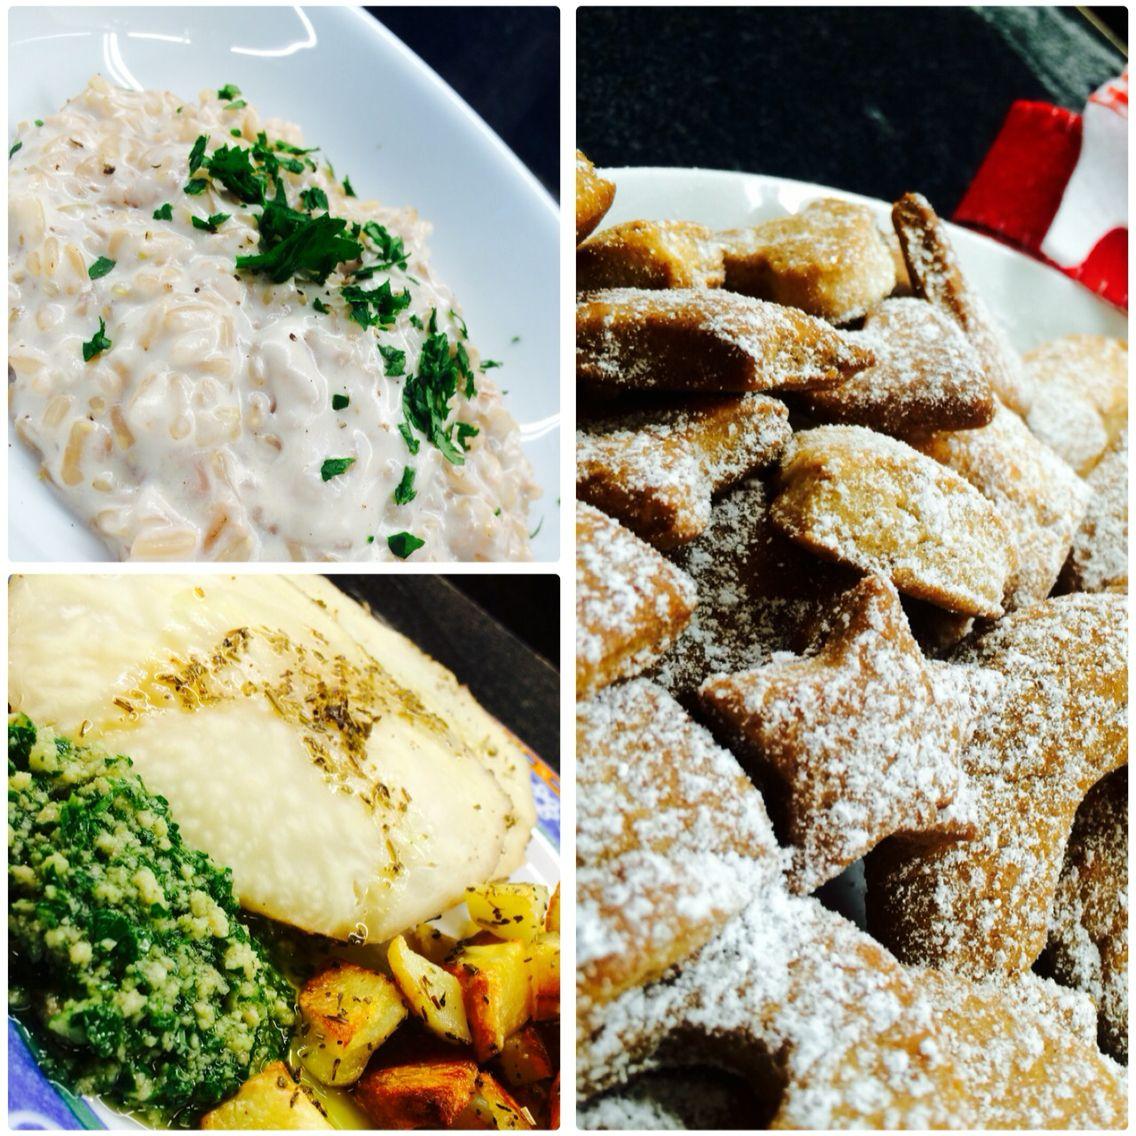 Risotto al limone,  sedano rapa al forno con salsa verde e patate, biscotti cannella/zenzero ❤️ #vegan #veganfood #foodporn #food #vegetarian #veg #vegano #veggie #veganfoodporn #veggies #veganfoodshare #veggy #veganlife #veganism #govegan #vegangirl #vegans #vegana #instavegan #veganrecipes #veganismo #vegani #veganinstagram